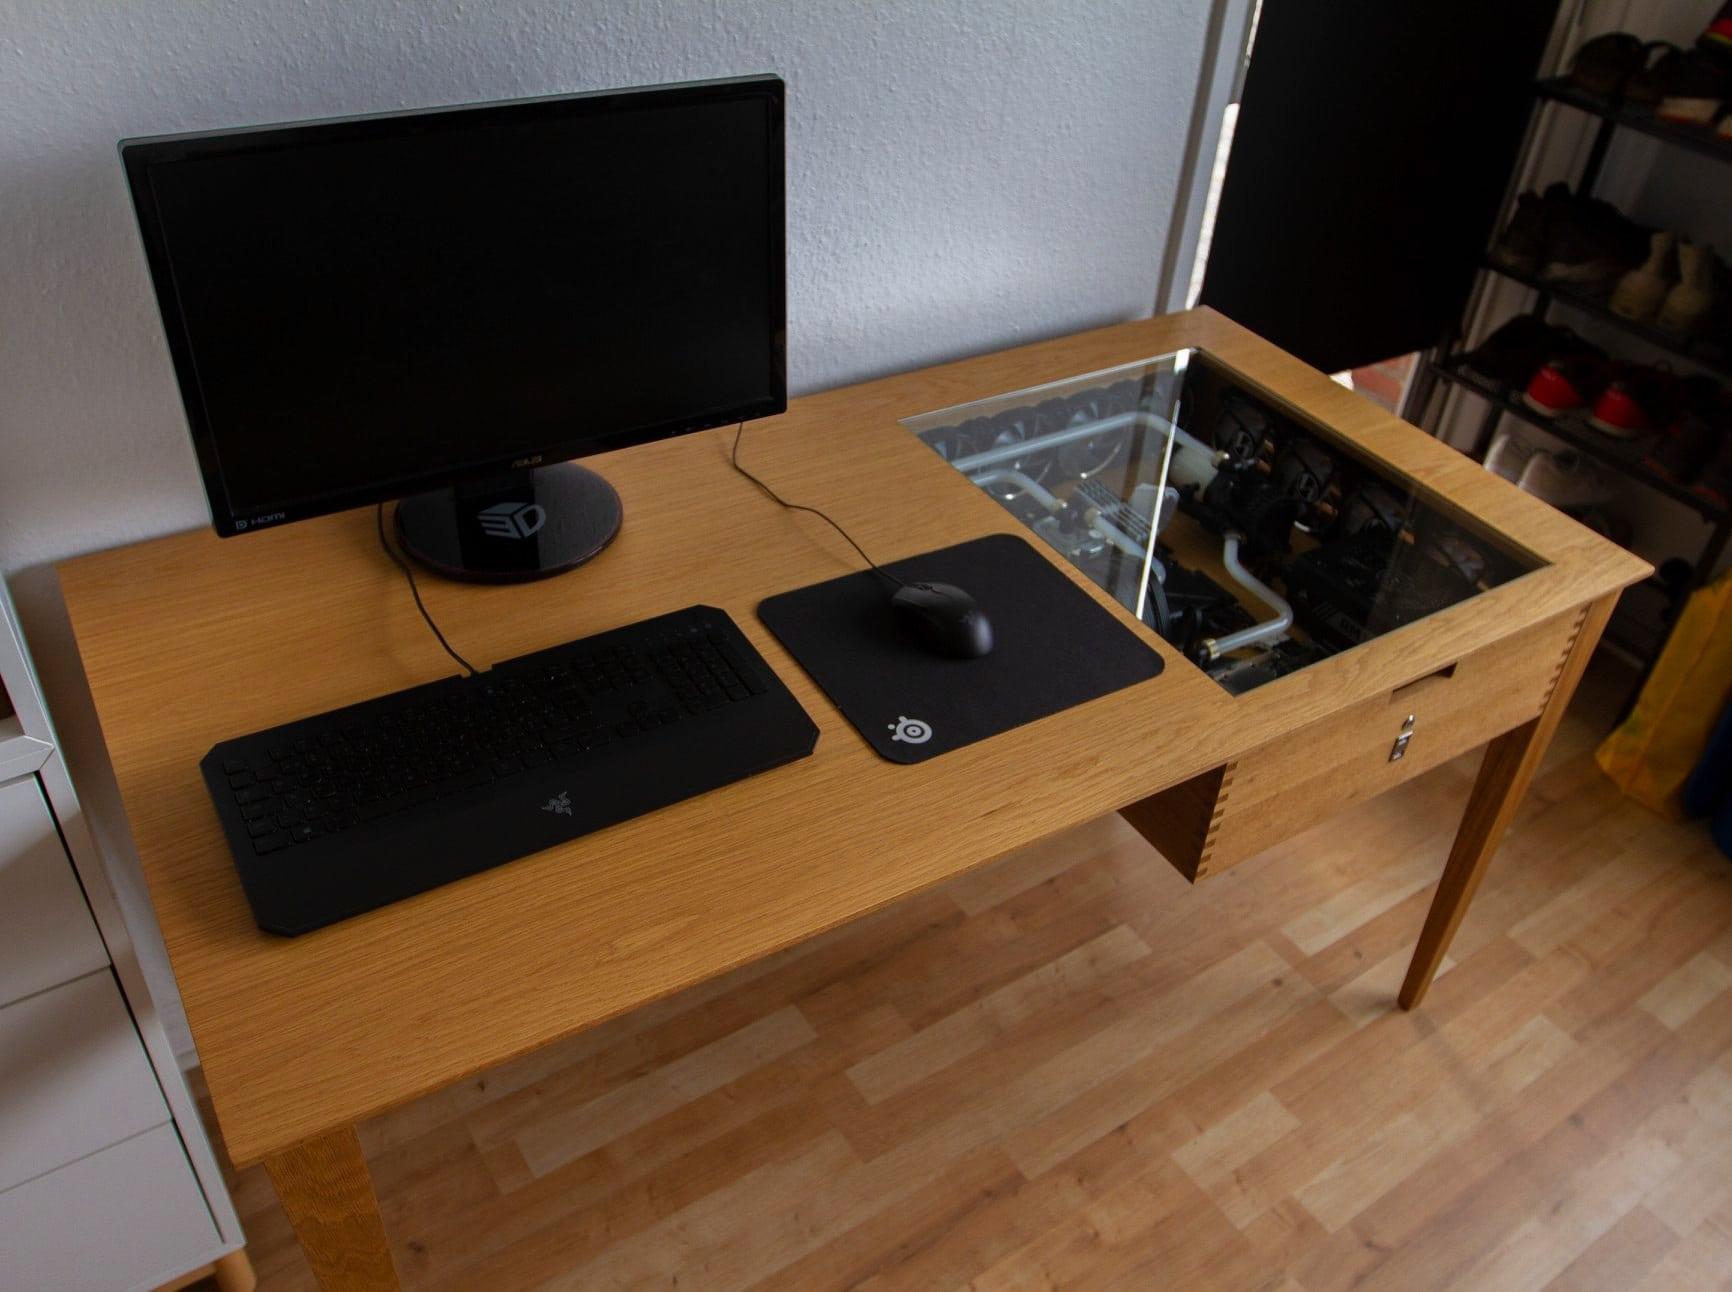 MA Modified's halfway showpiece desk PC